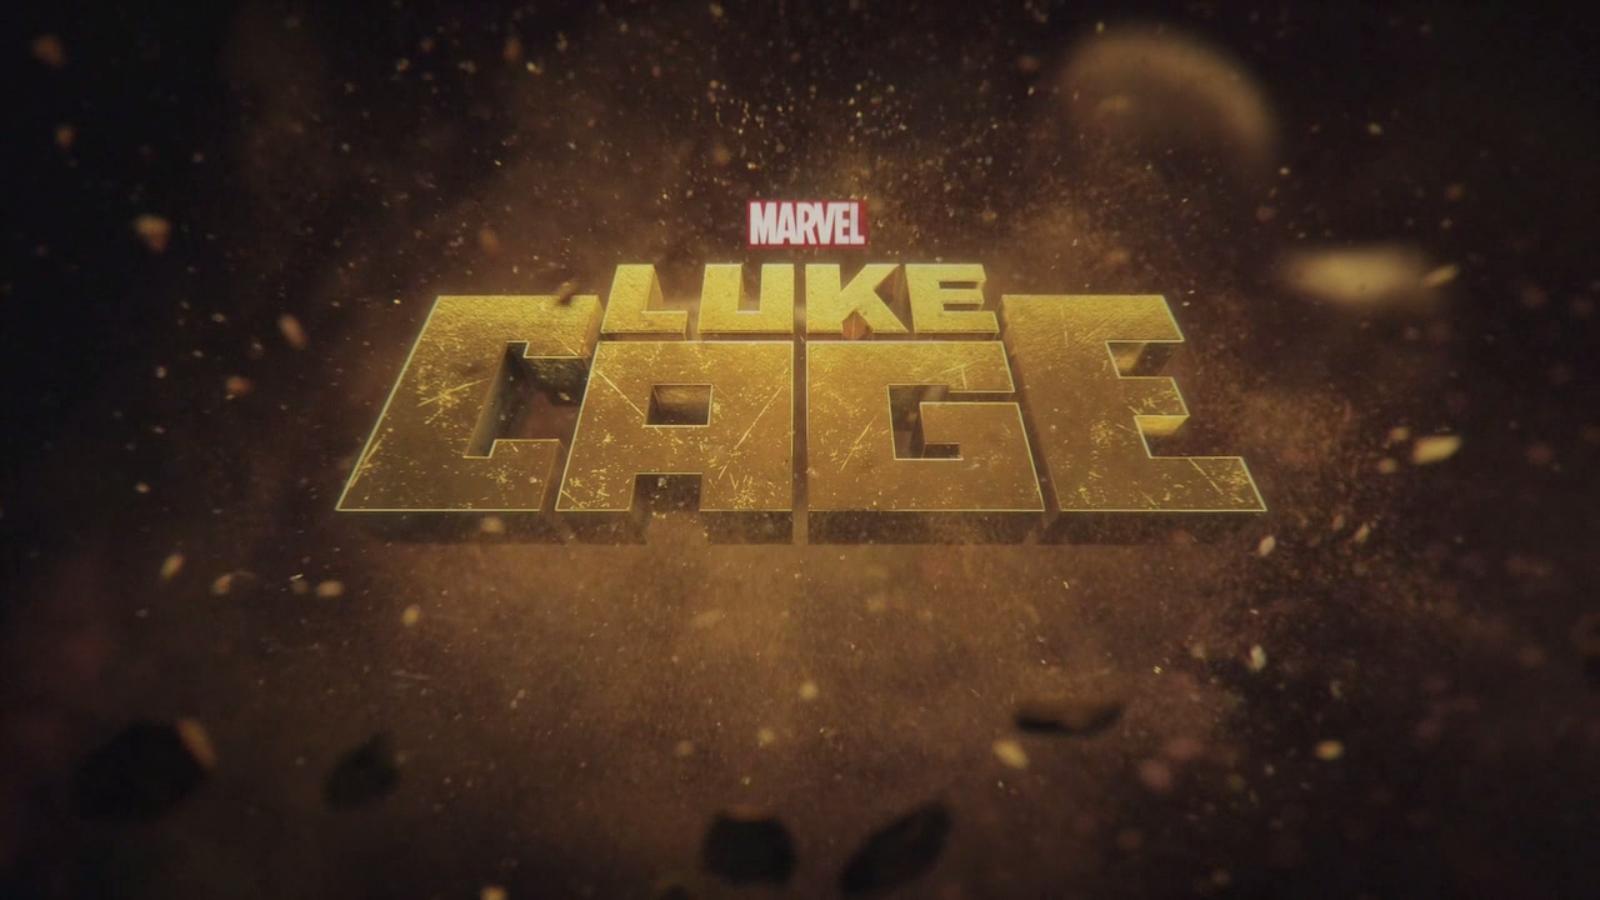 Luke Cage TV series Marvel Cinematic Universe Wiki 1600x900